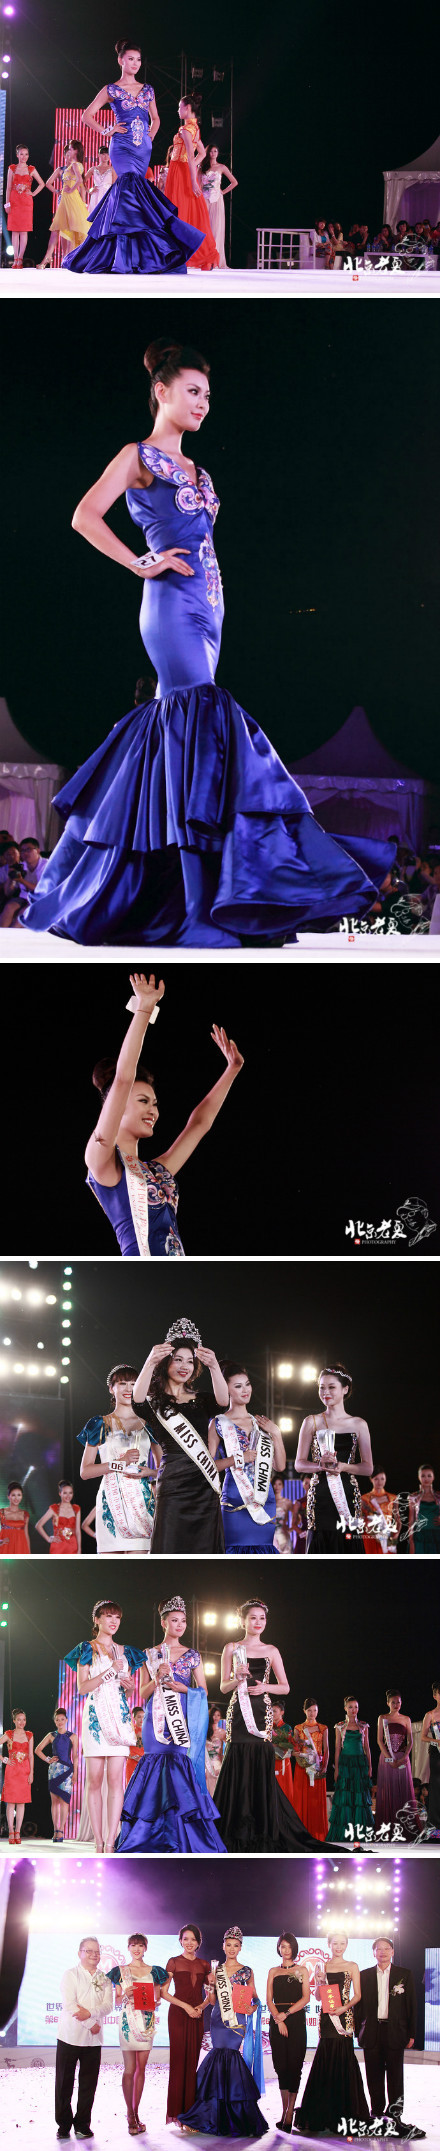 wenxia yu, miss world 2012.  - Página 12 6d9b2510